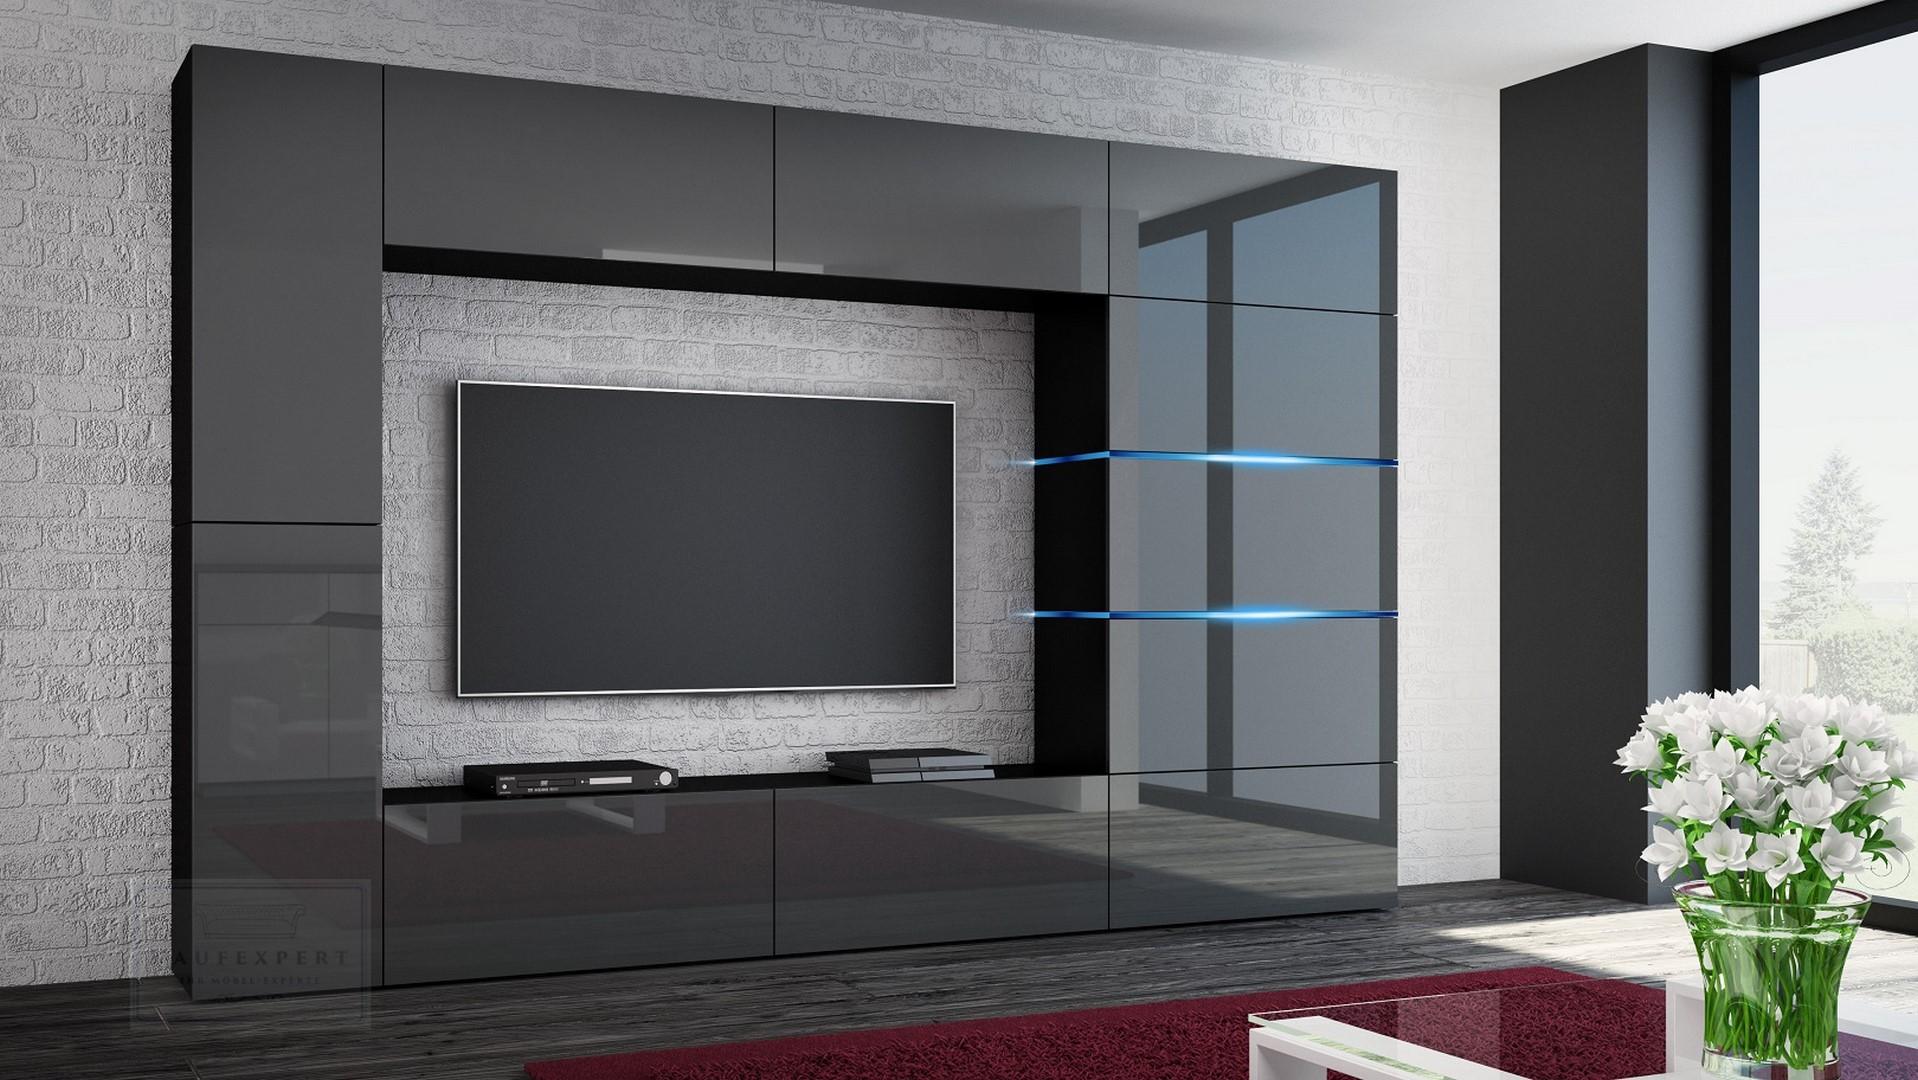 Wohnwand Grau Matt ~ Kaufexpert wohnwand shadow grau hochglanz schwarz 285 cm mediawand